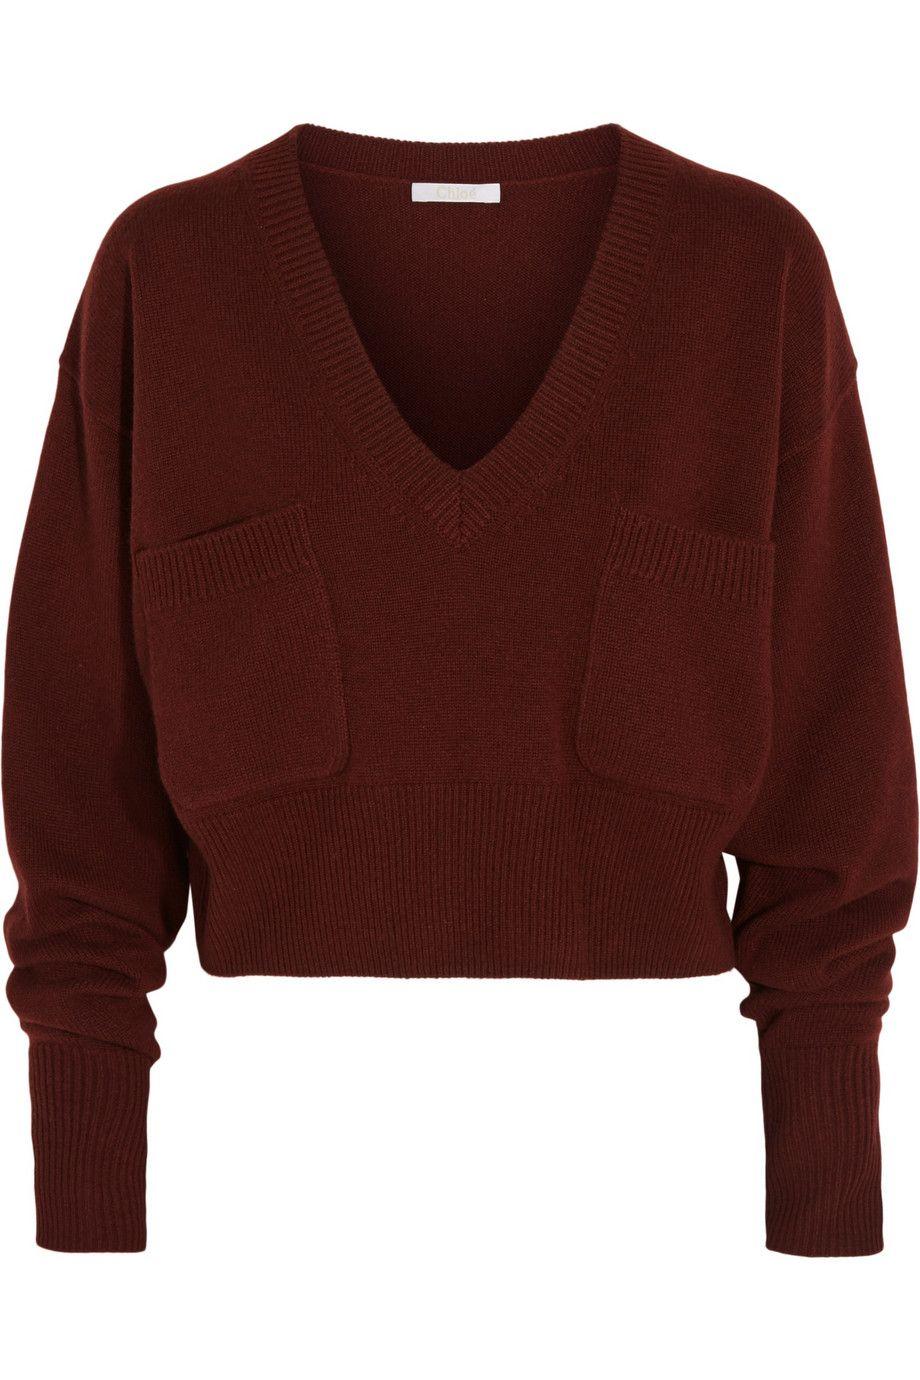 Chloé | Cropped cashmere sweater | NET-A-PORTER.COM | Knitwear ...